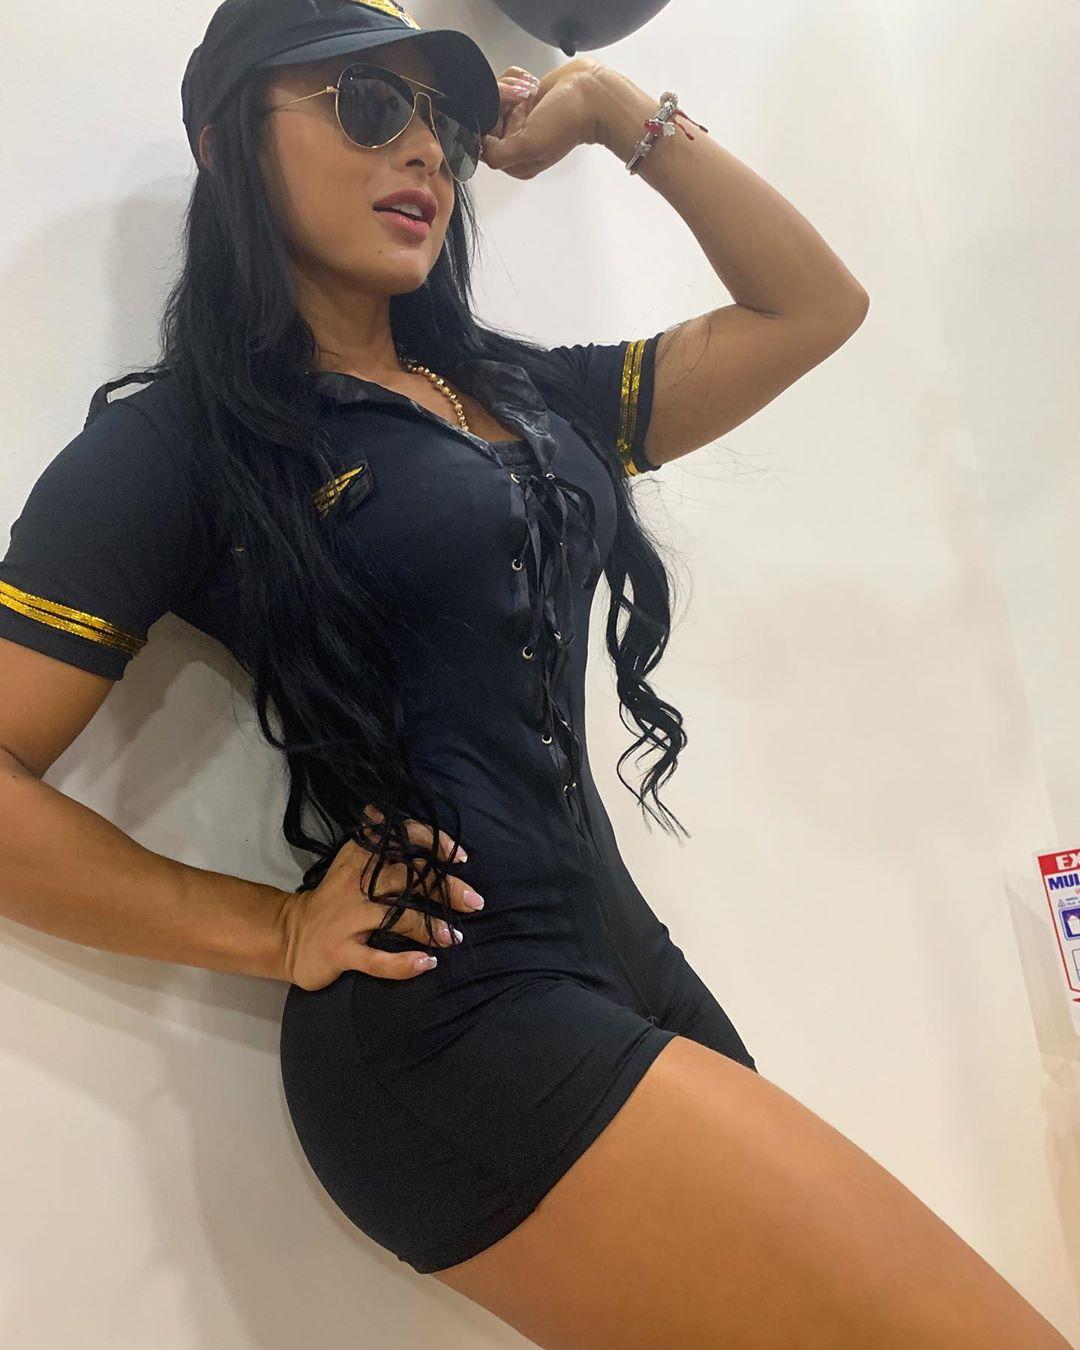 Paola-Macias-Wallpapers-Insta-Fit-Bio-5